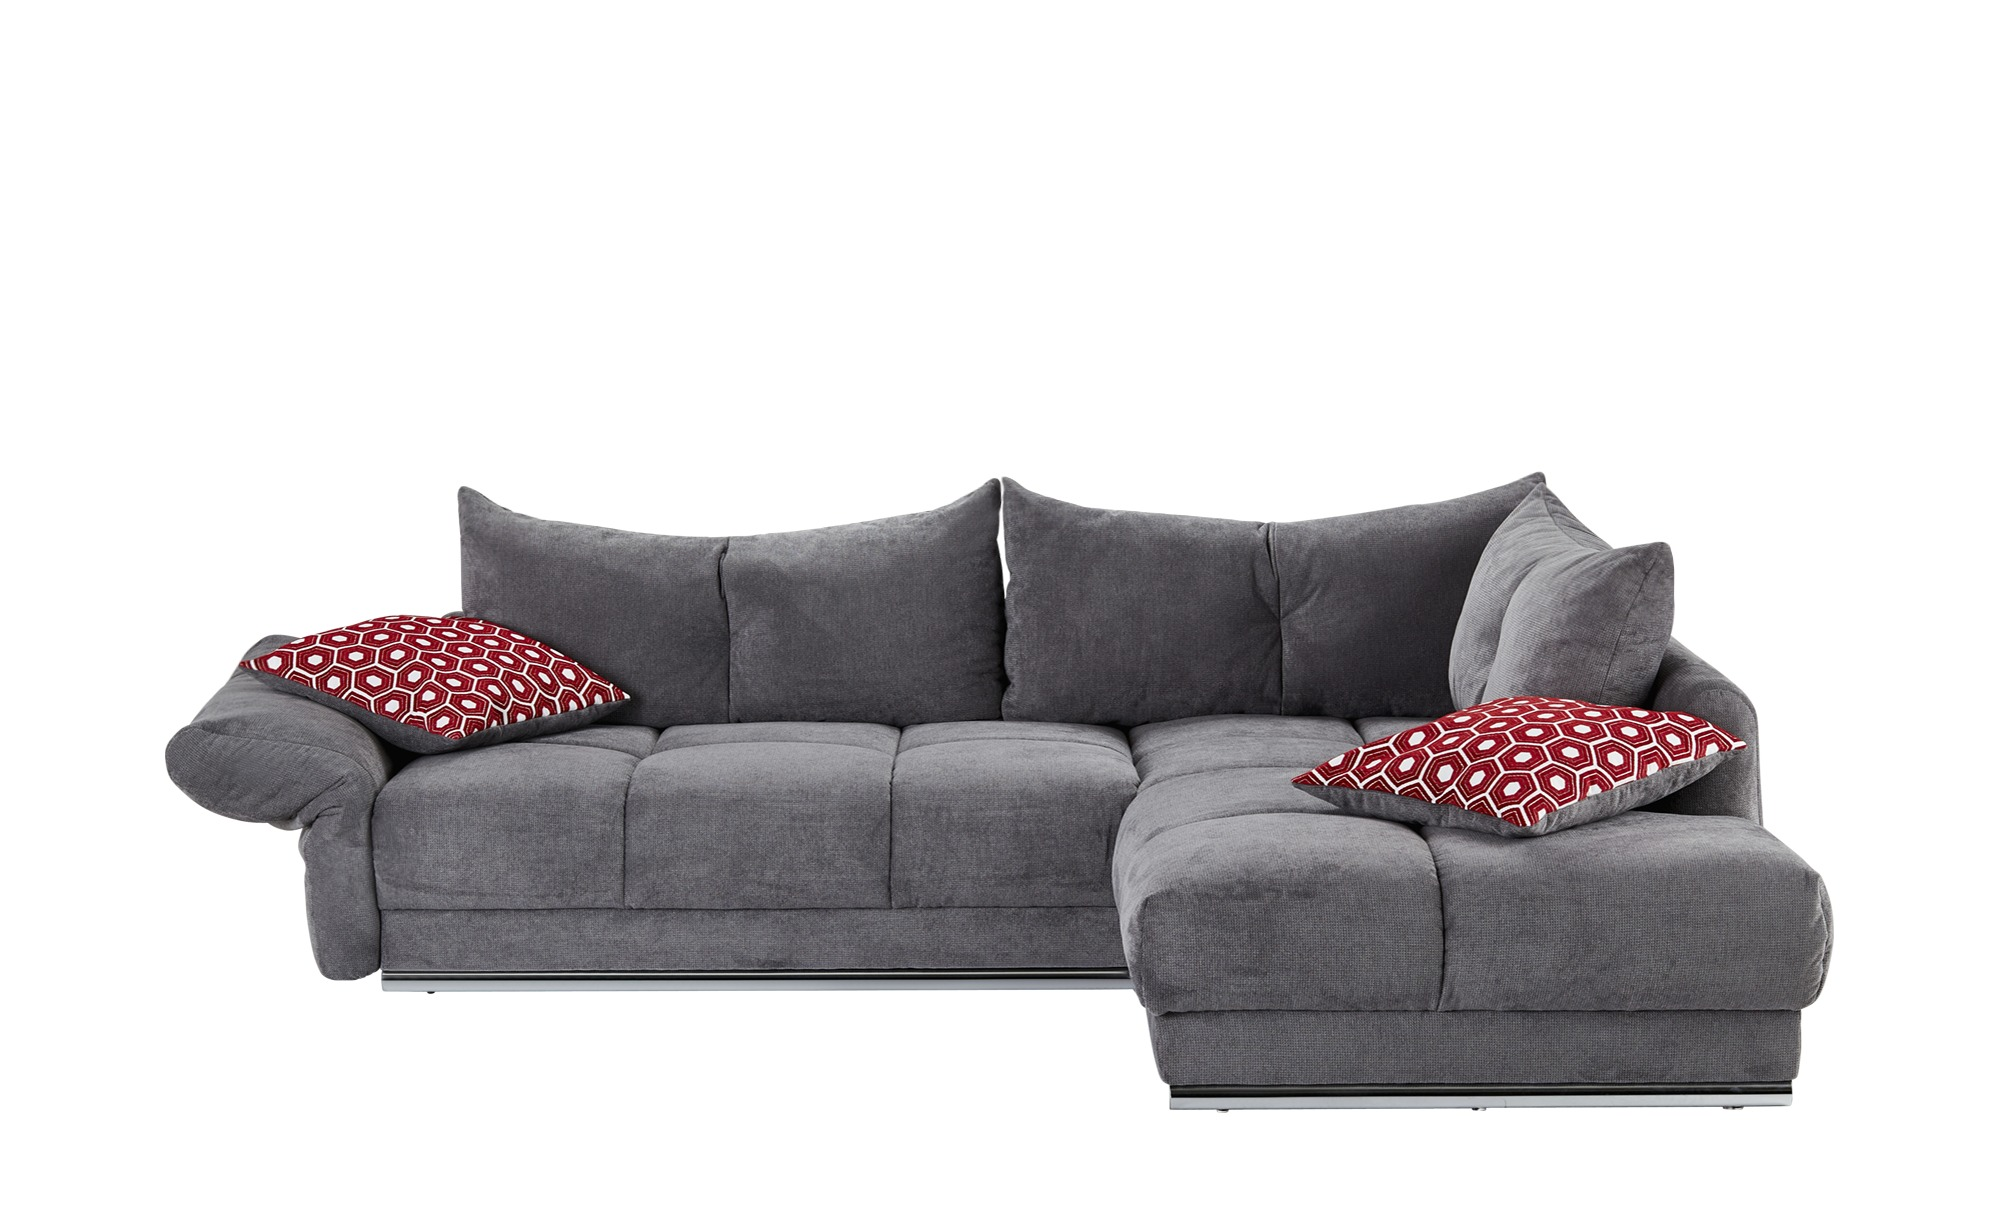 Bobb ecksofa petrissa breite h he grau online kaufen bei for Couch 45 grad